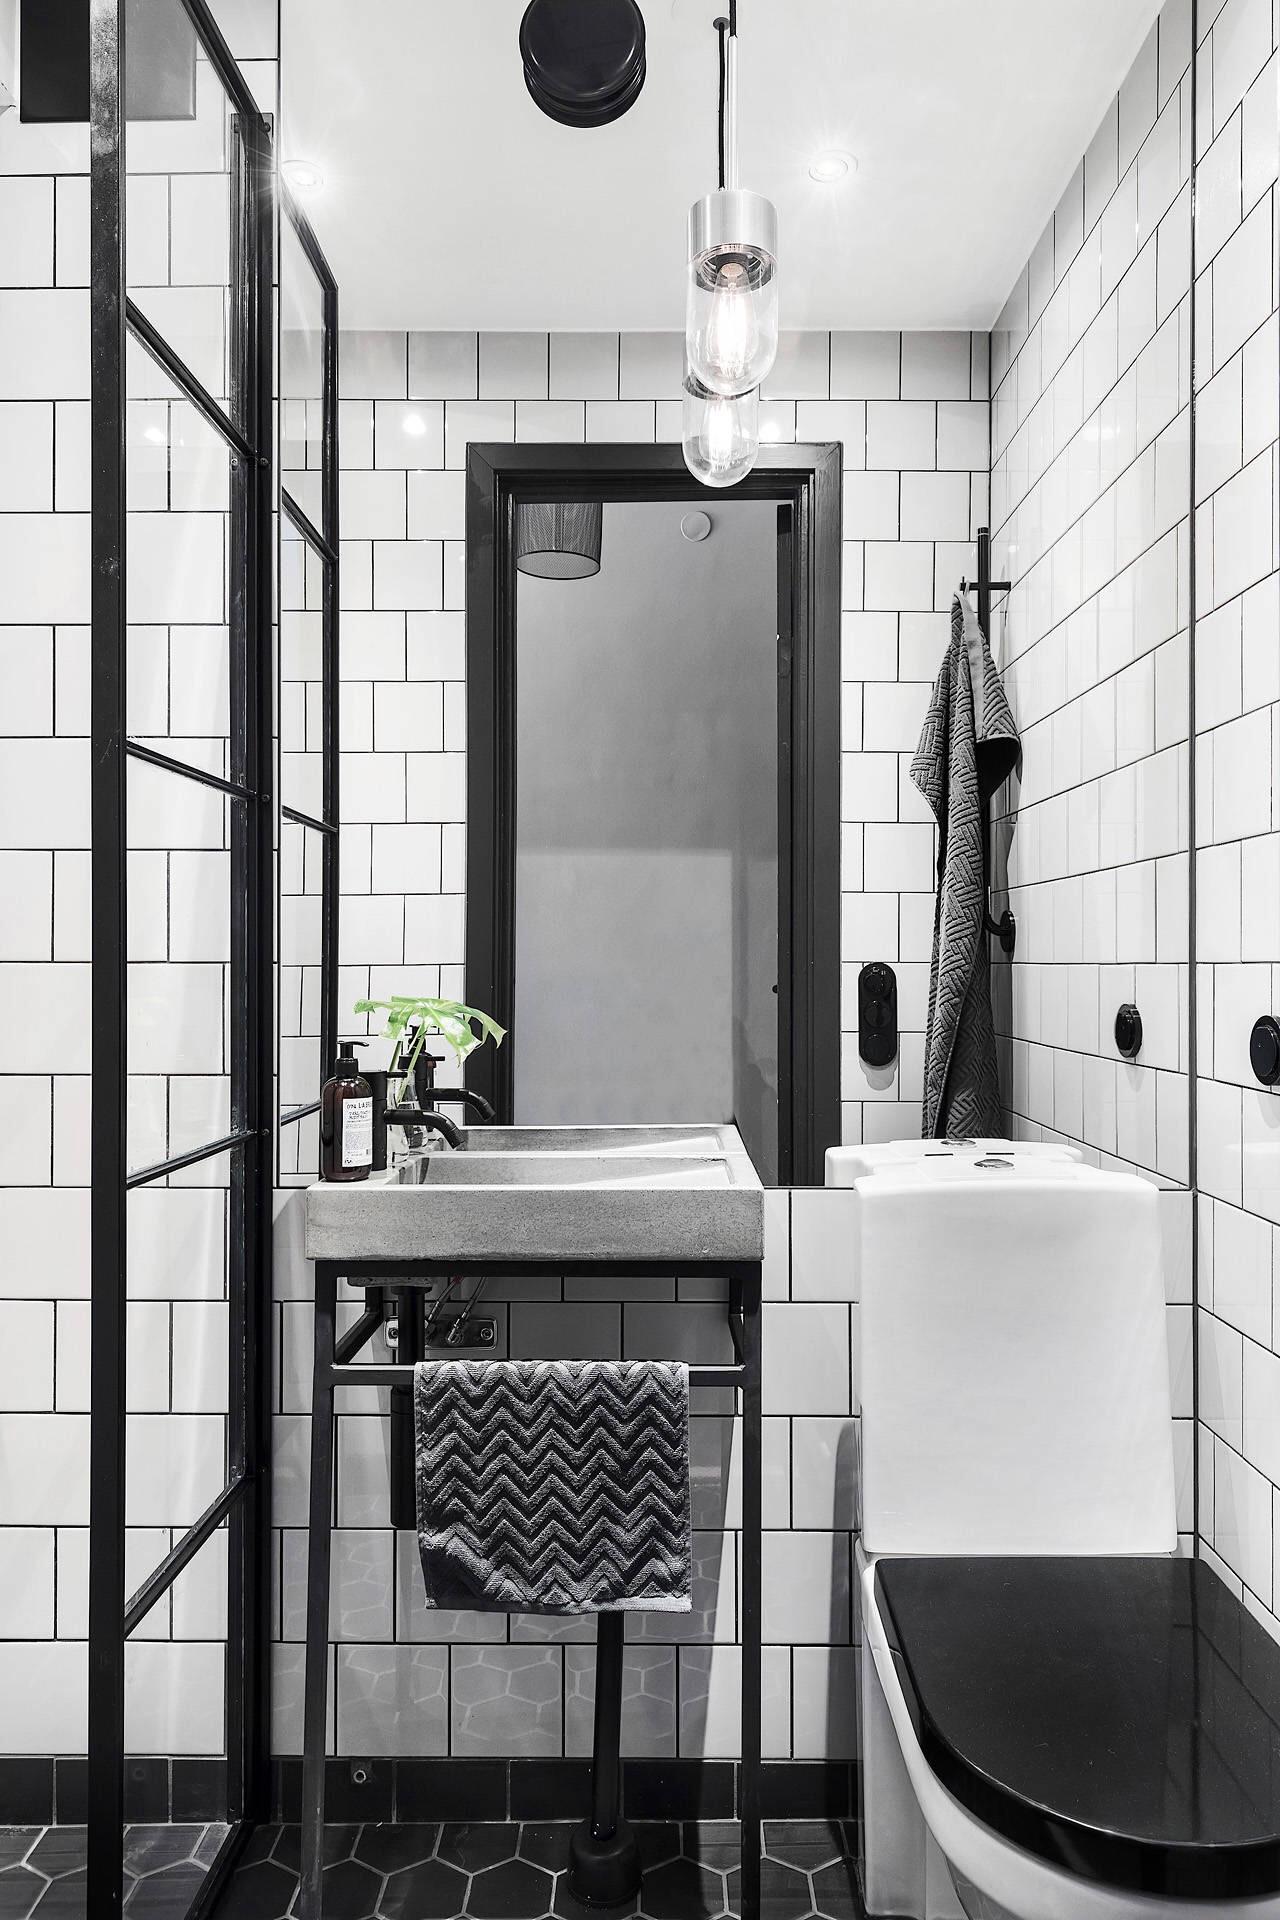 санузел раковина зеркало белая квадратная плитка стеклянная перегородка